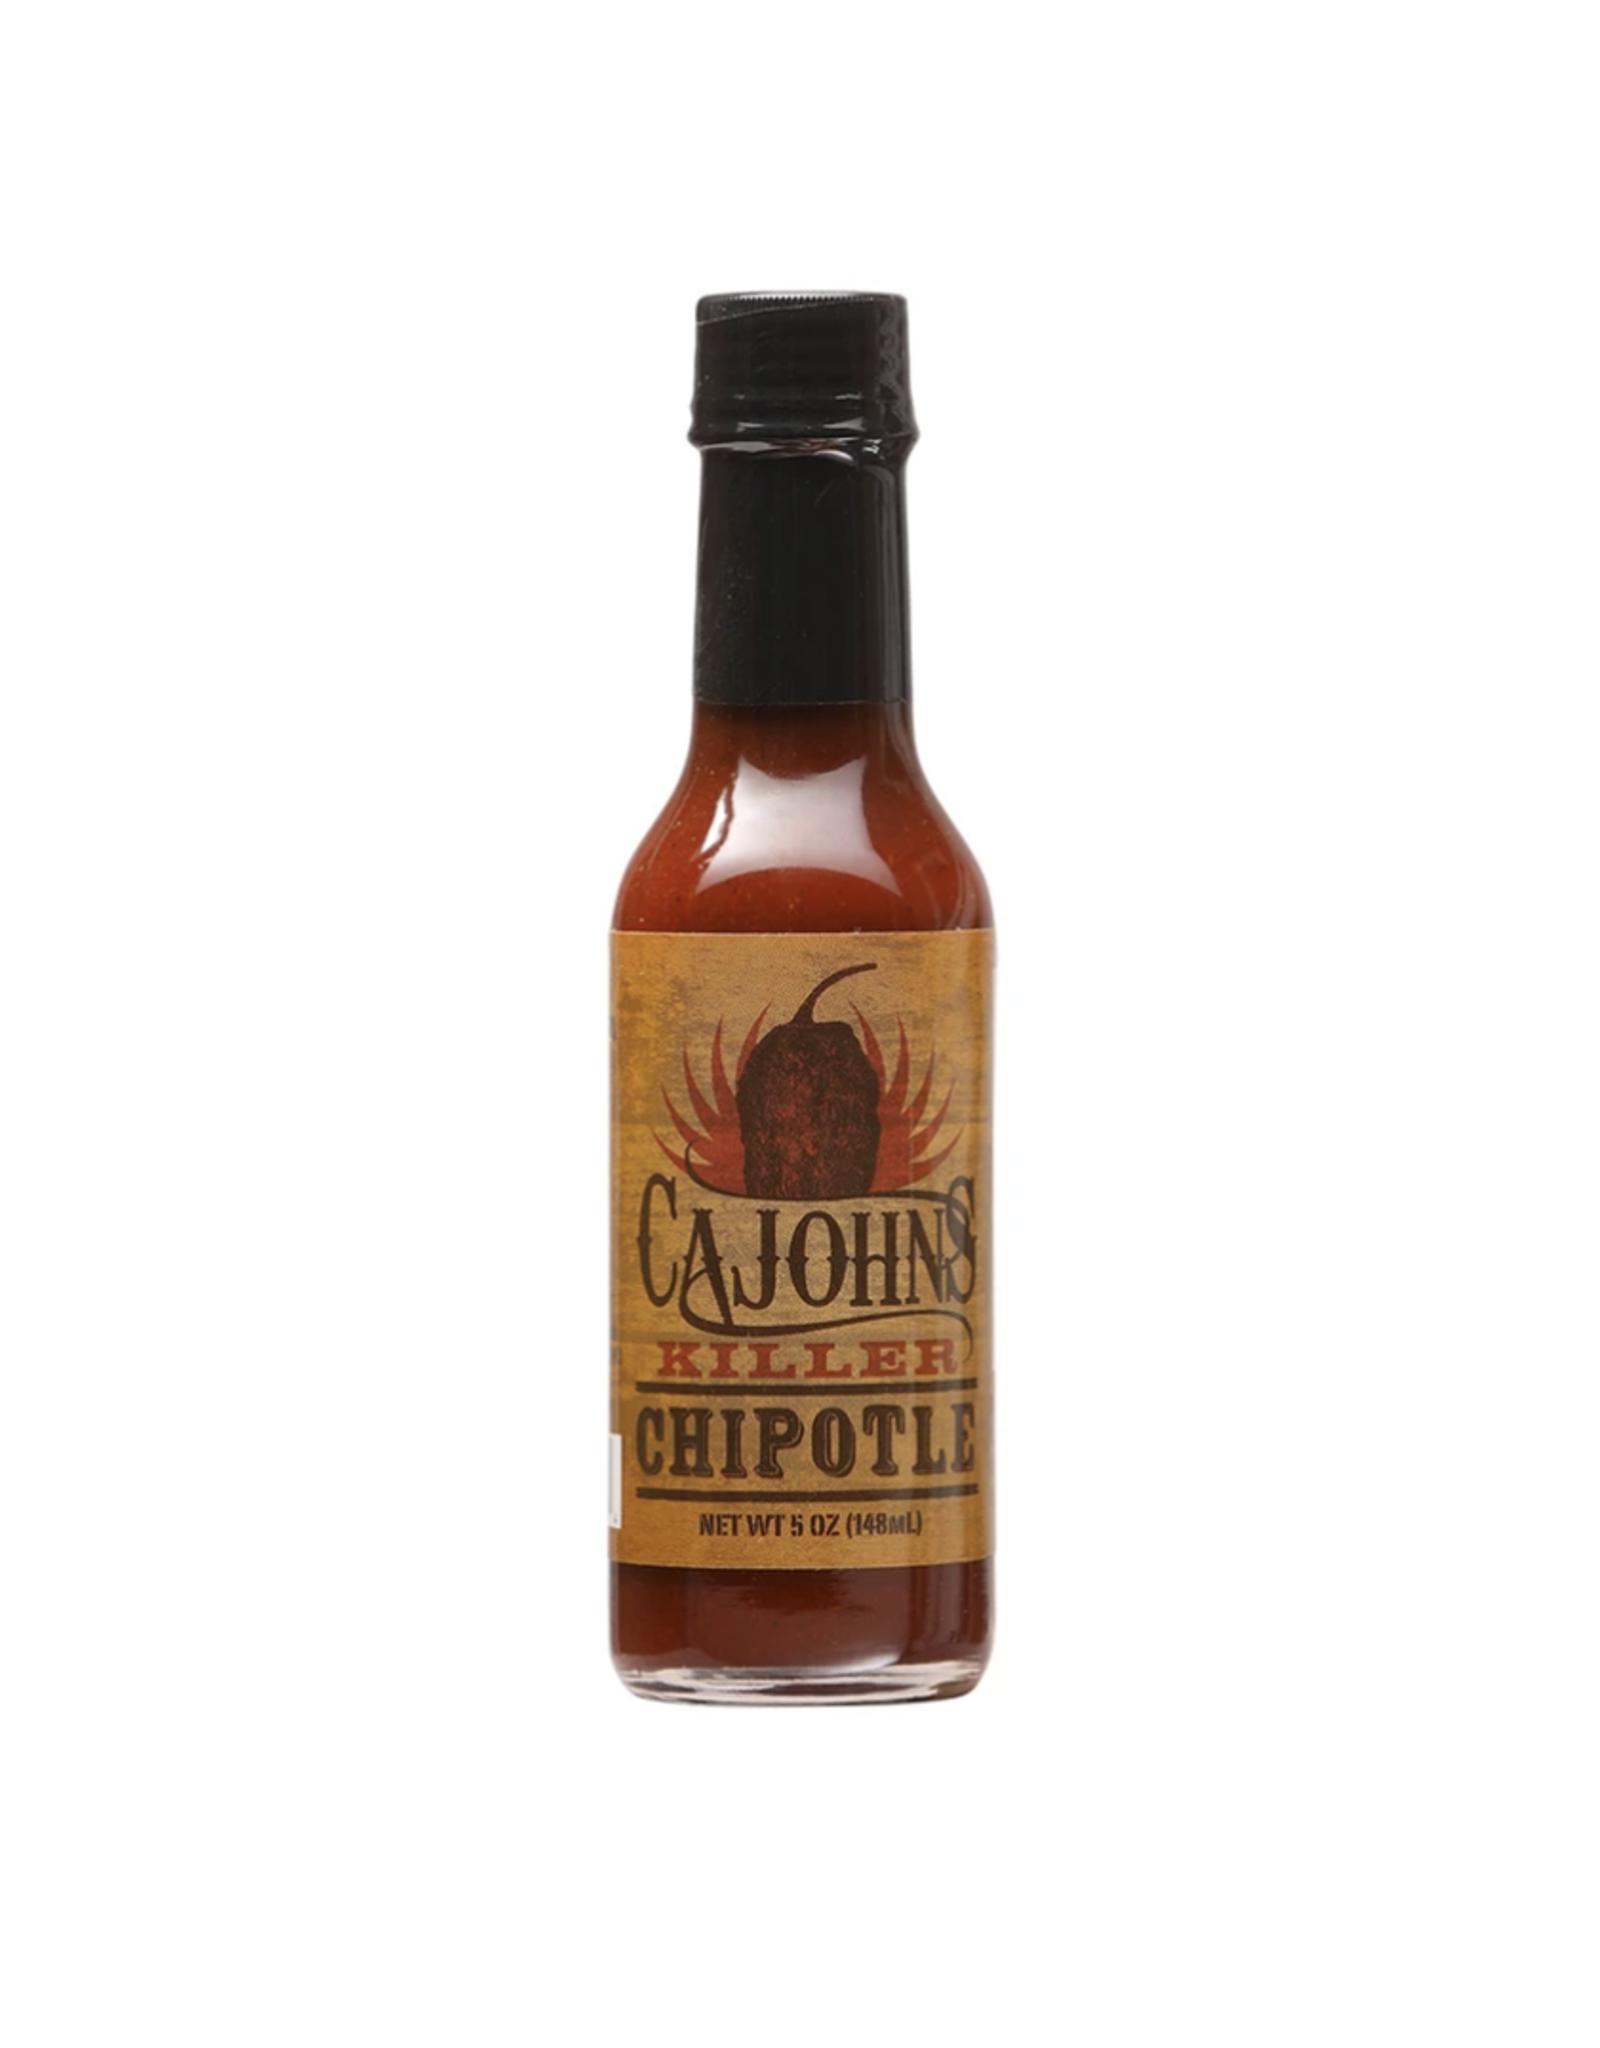 Cajohns Killer Chipotle Hot Sauce